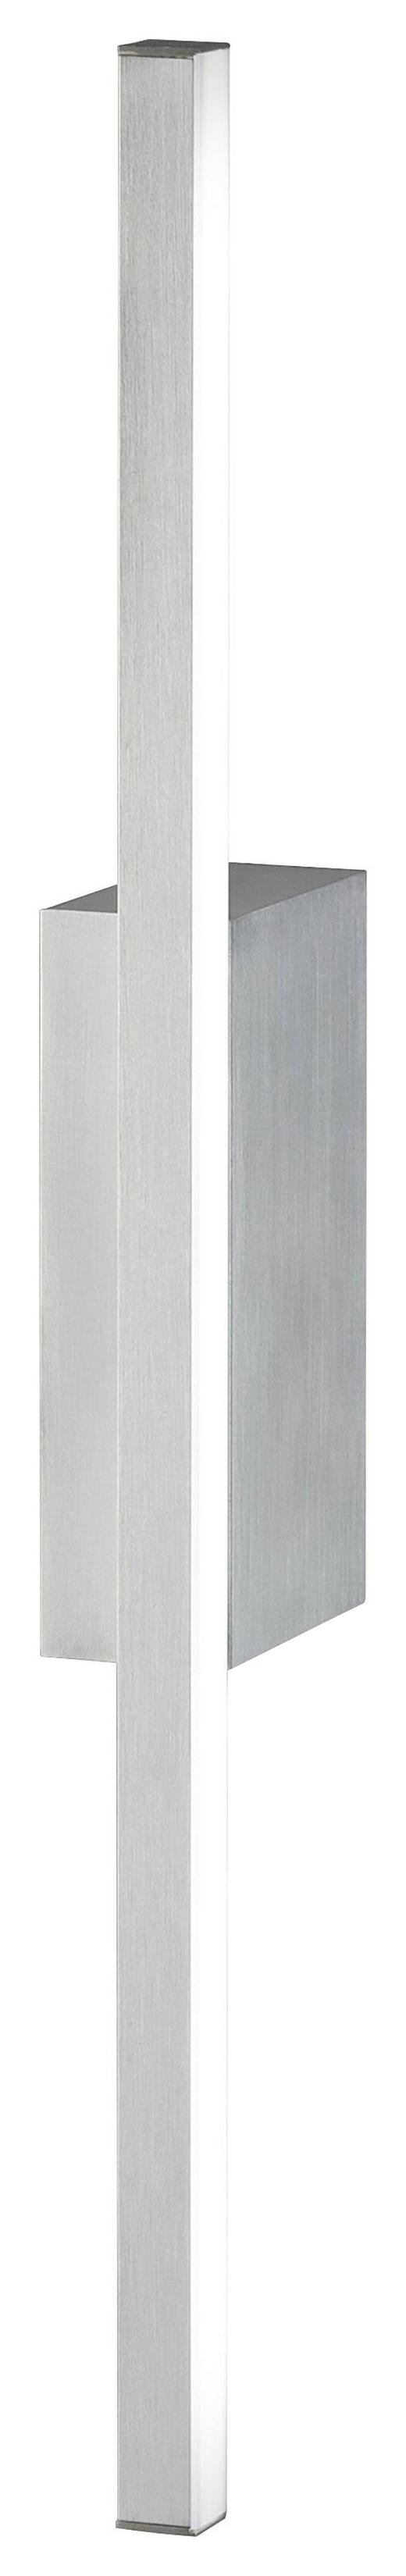 LED-WANDLEUCHTE - Alufarben, Design, Metall (49,4/9,4/4cm)